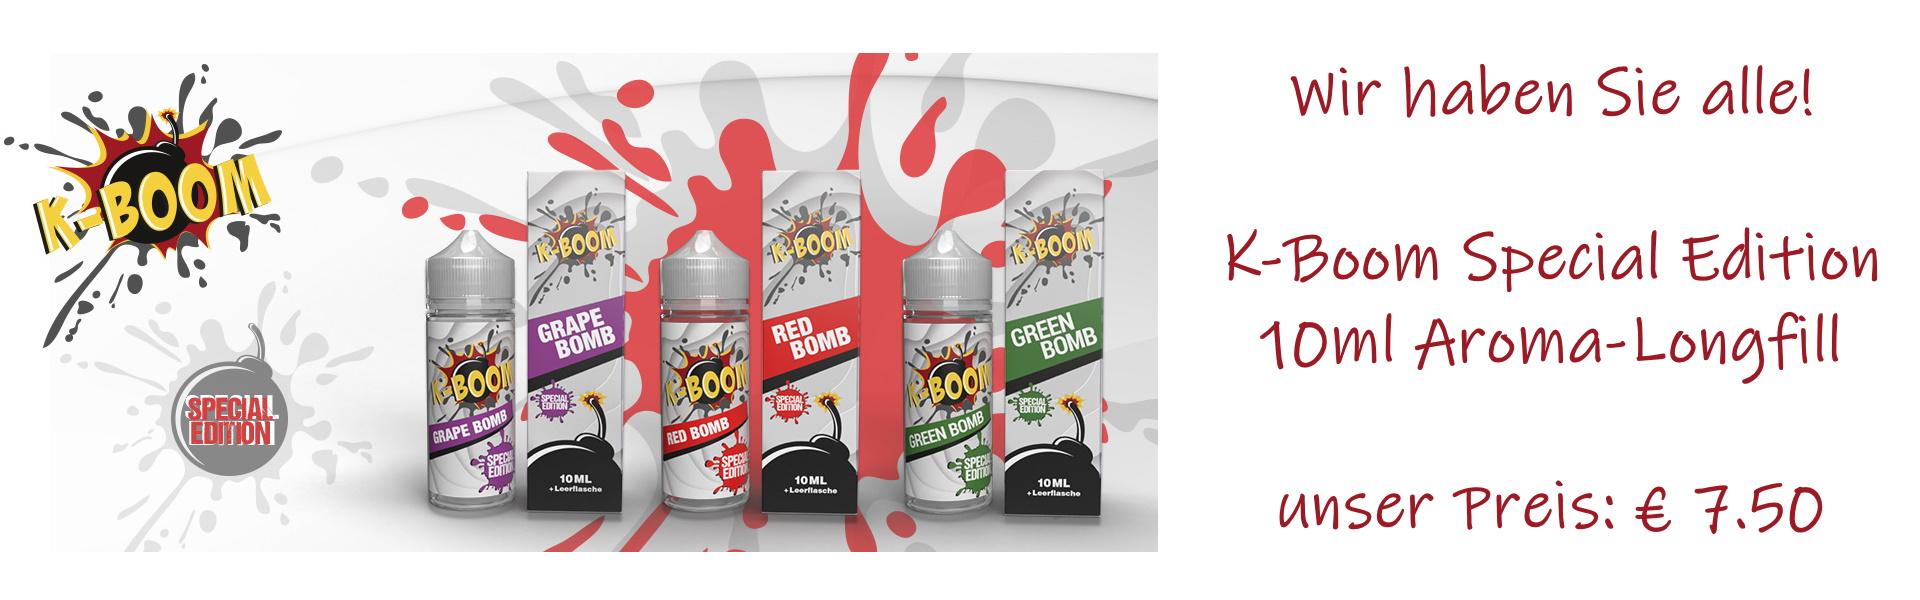 Die komplette K-Boom Special Edition bei uns.